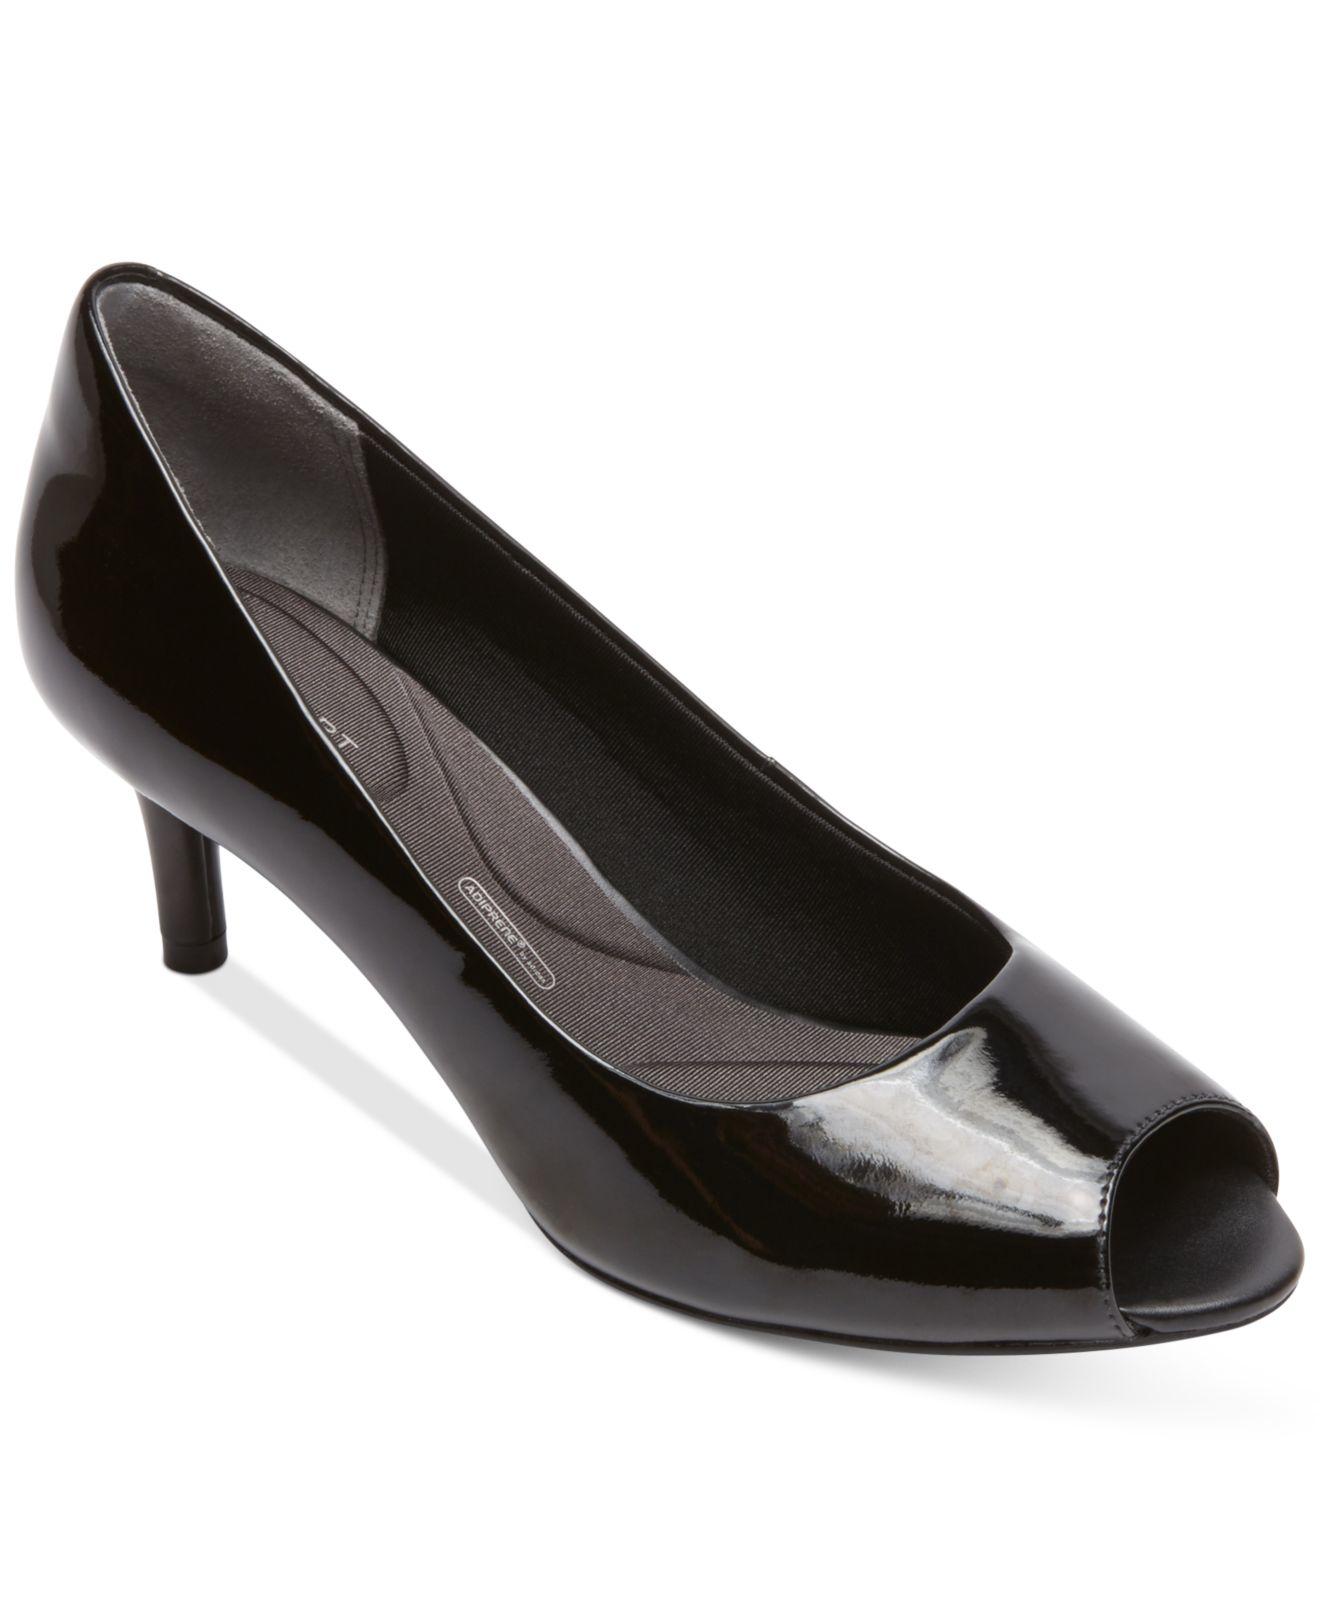 Black Peep Toe Kitten Heel Shoes